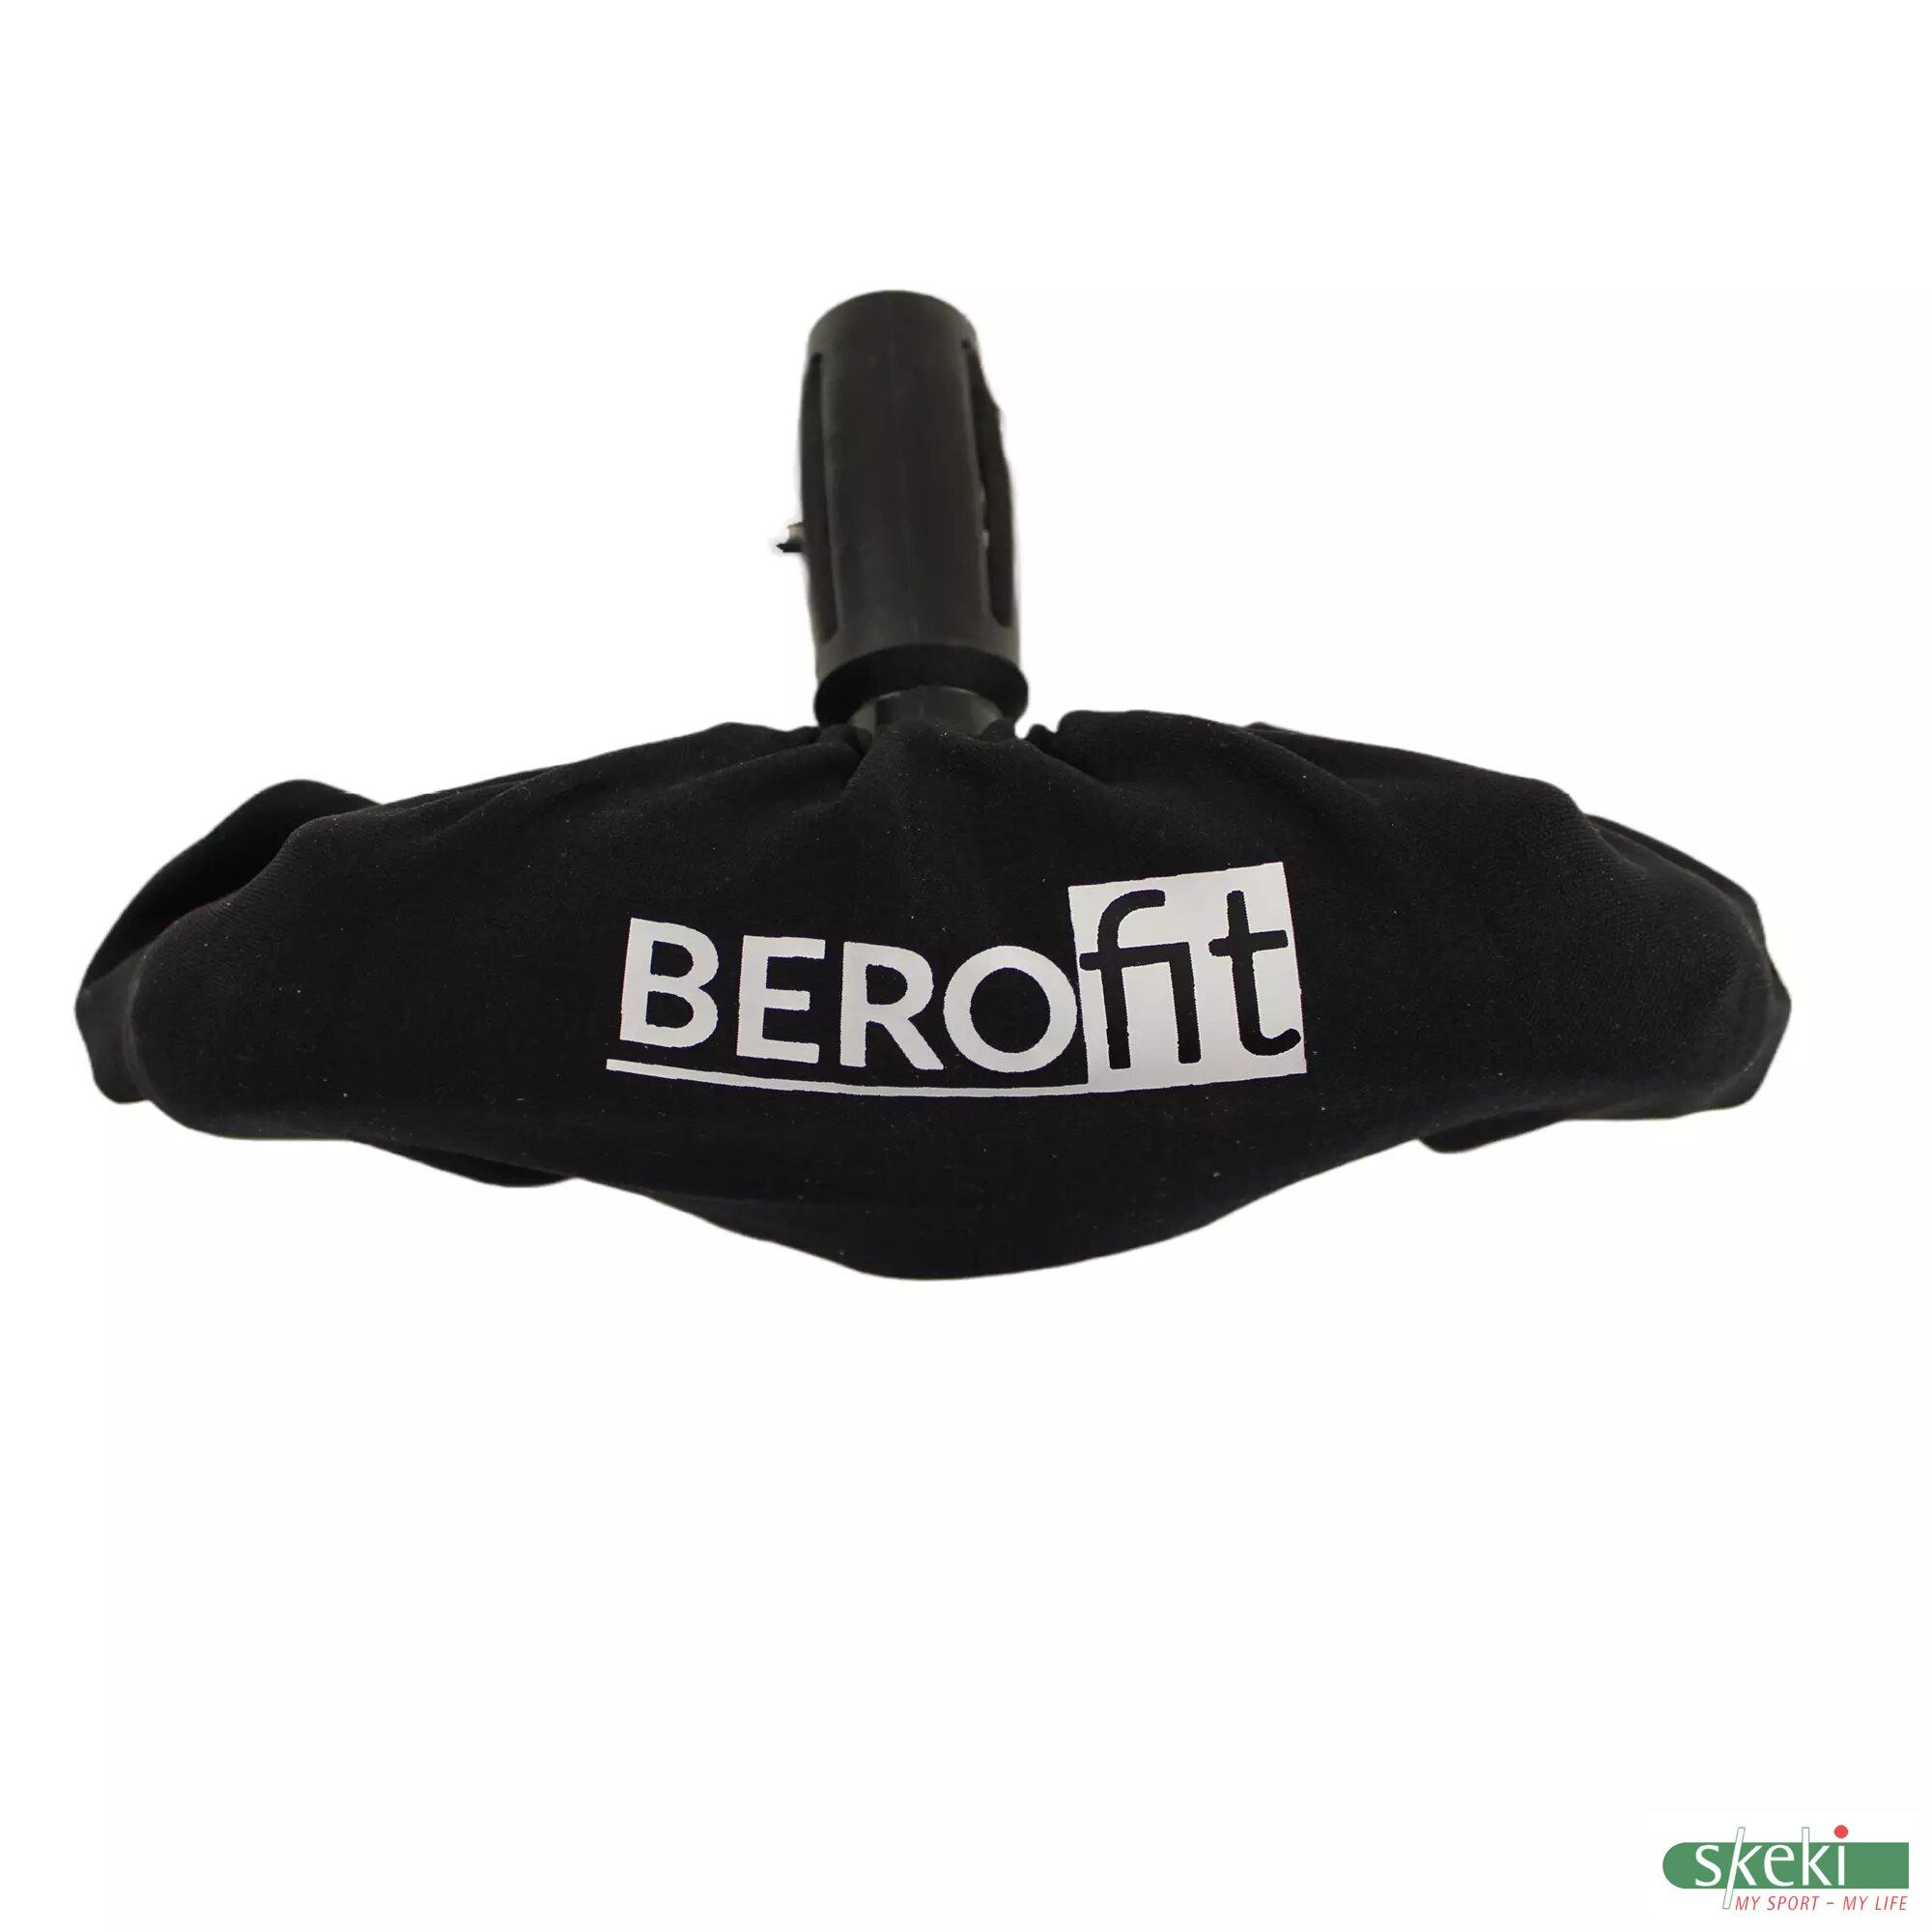 Curling Broom Head Cover Skeki De